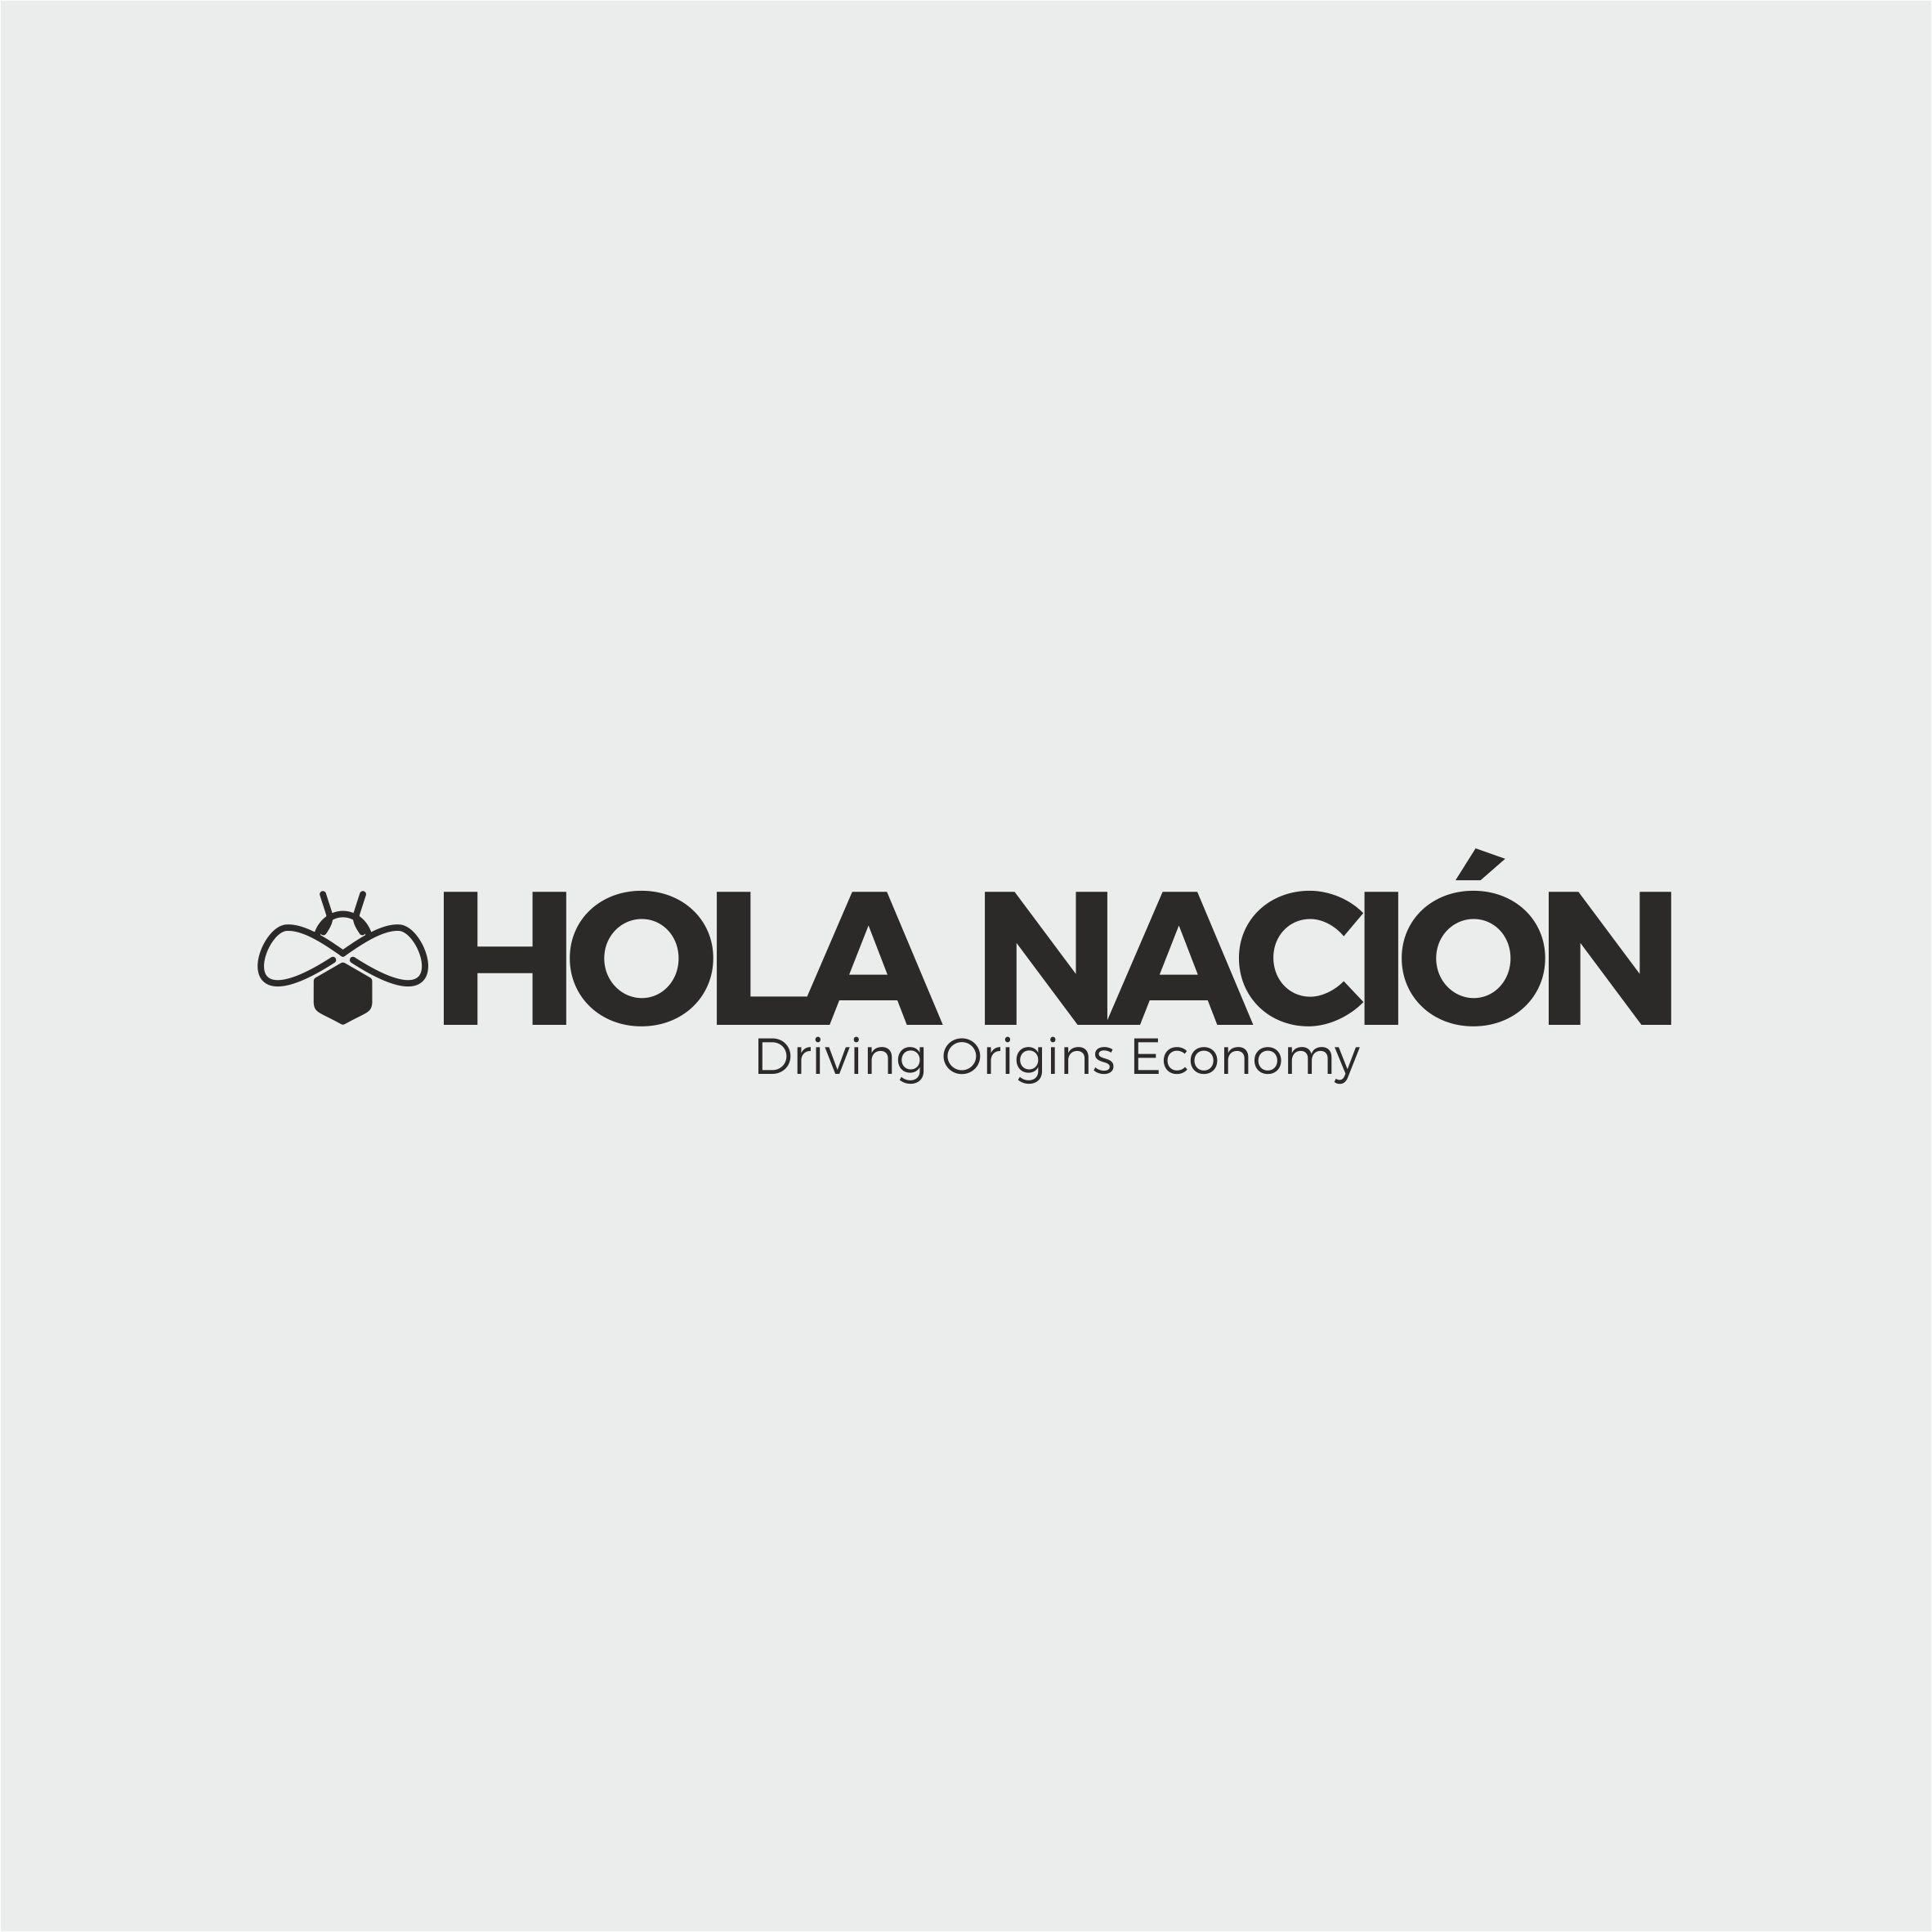 Hola Nación® Driving Origins Econony: SOCIAL IMPACT + ECONOMIC IMPACT+PERSONAL IMPACT+ ENVIRONMENTAL IMPACT